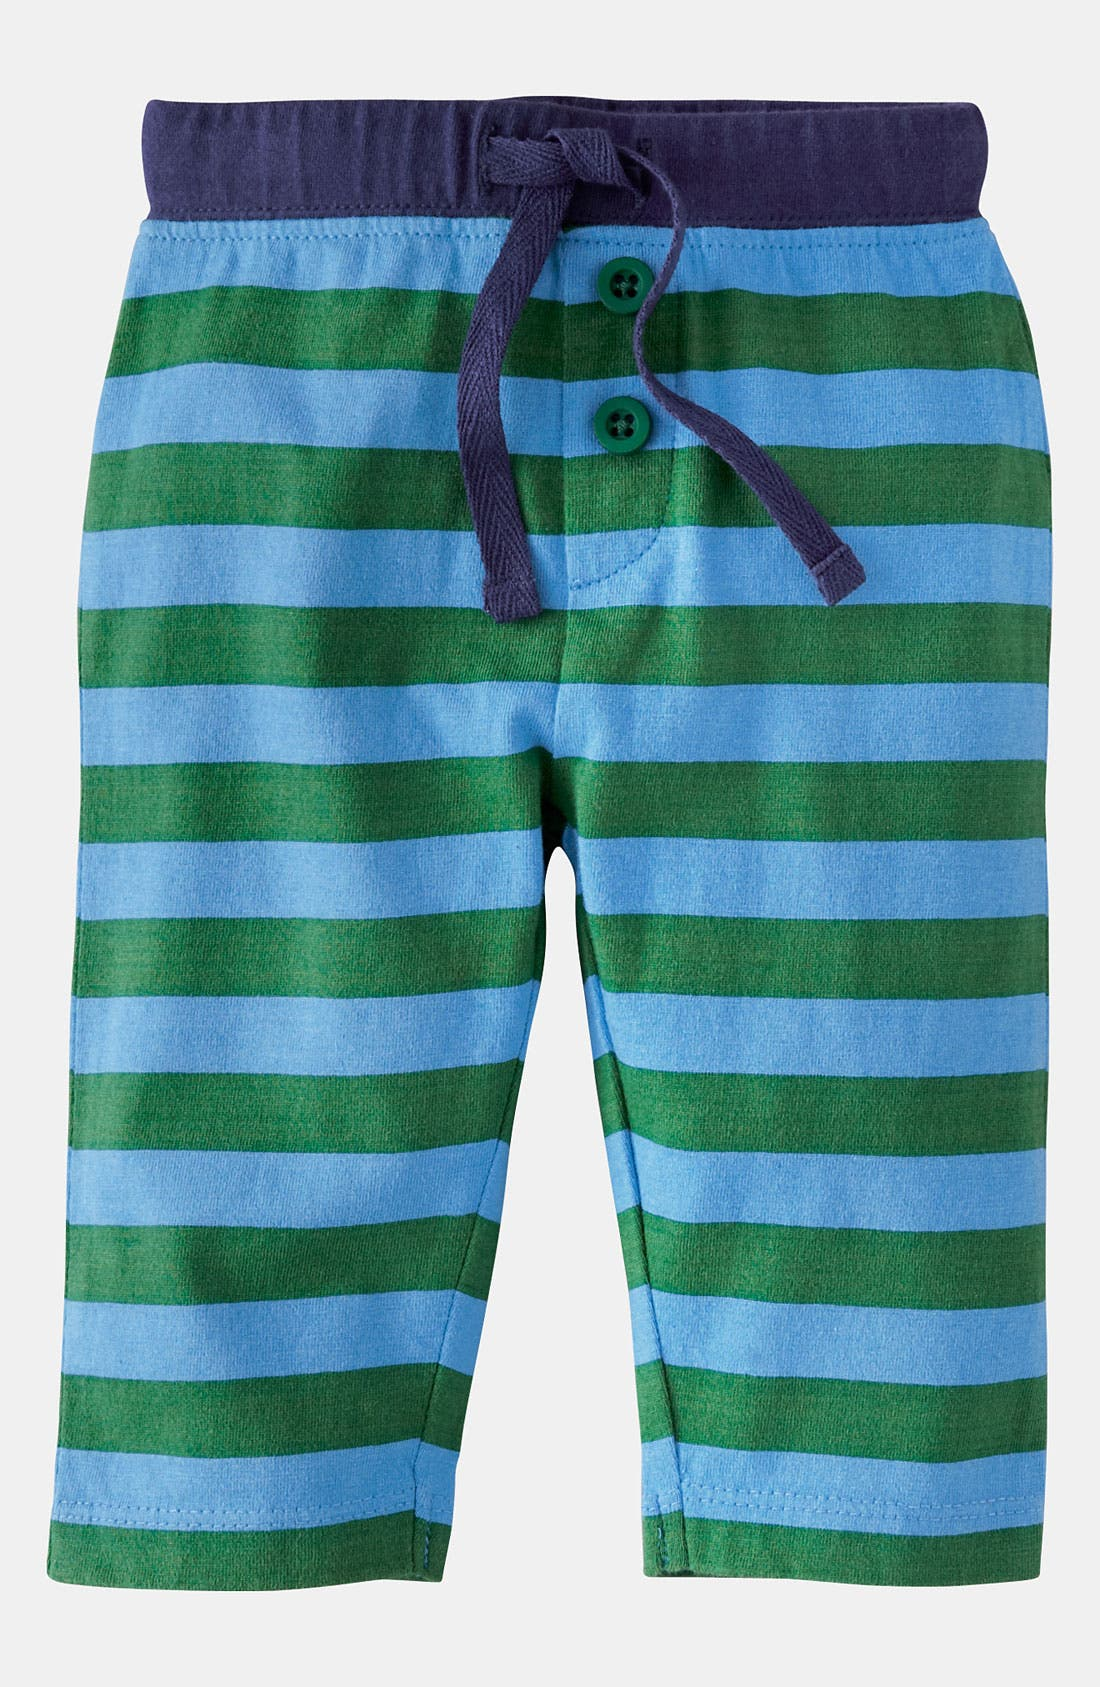 Alternate Image 1 Selected - Mini Boden 'Stripy' Jersey Pants (Baby)